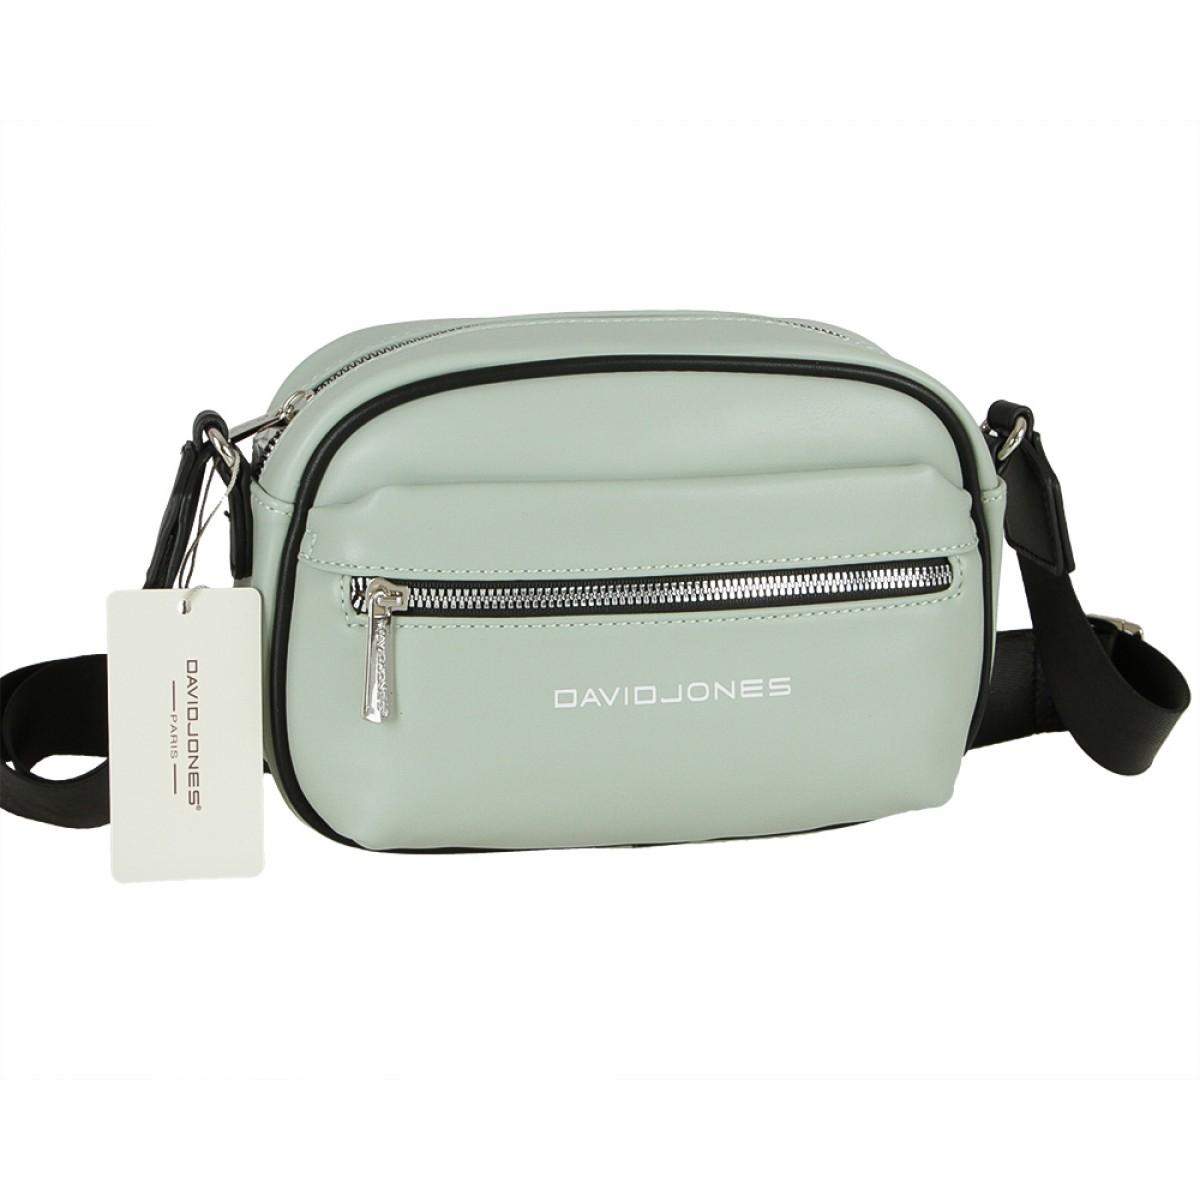 Жіноча сумка David Jones 6208-1 PALE GREEN